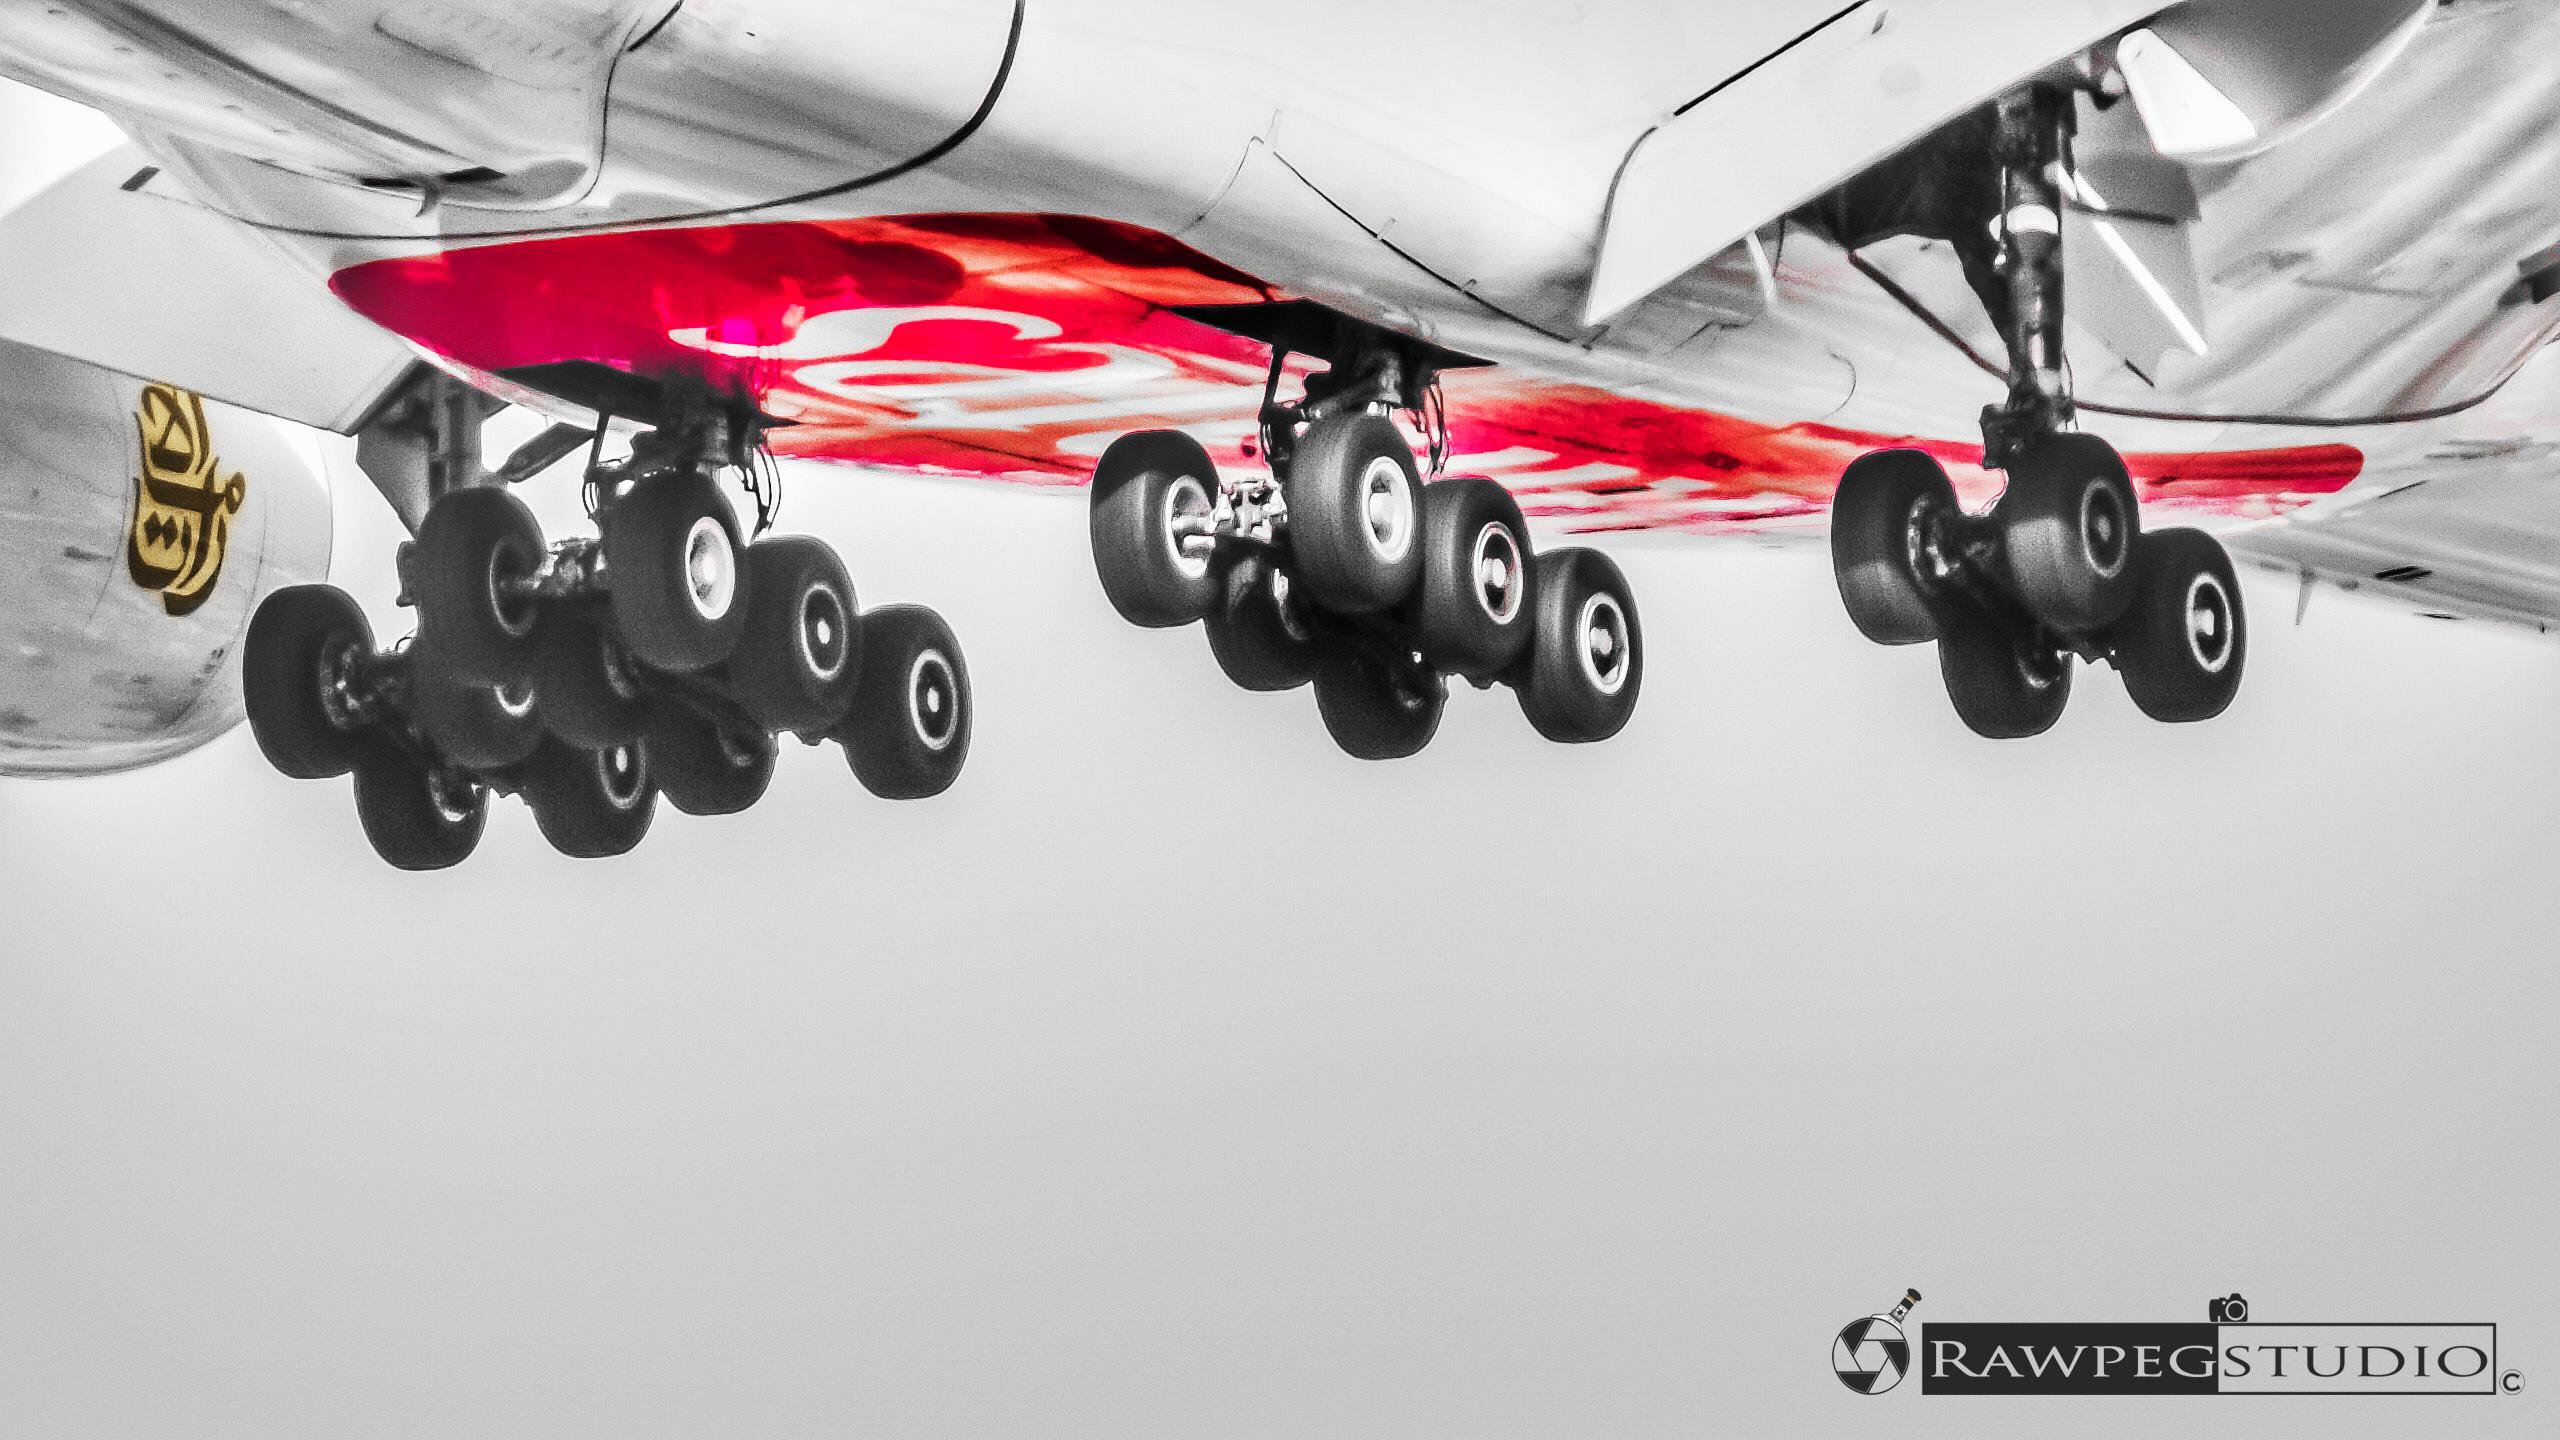 #rawpegstudio#aircraft#emirates